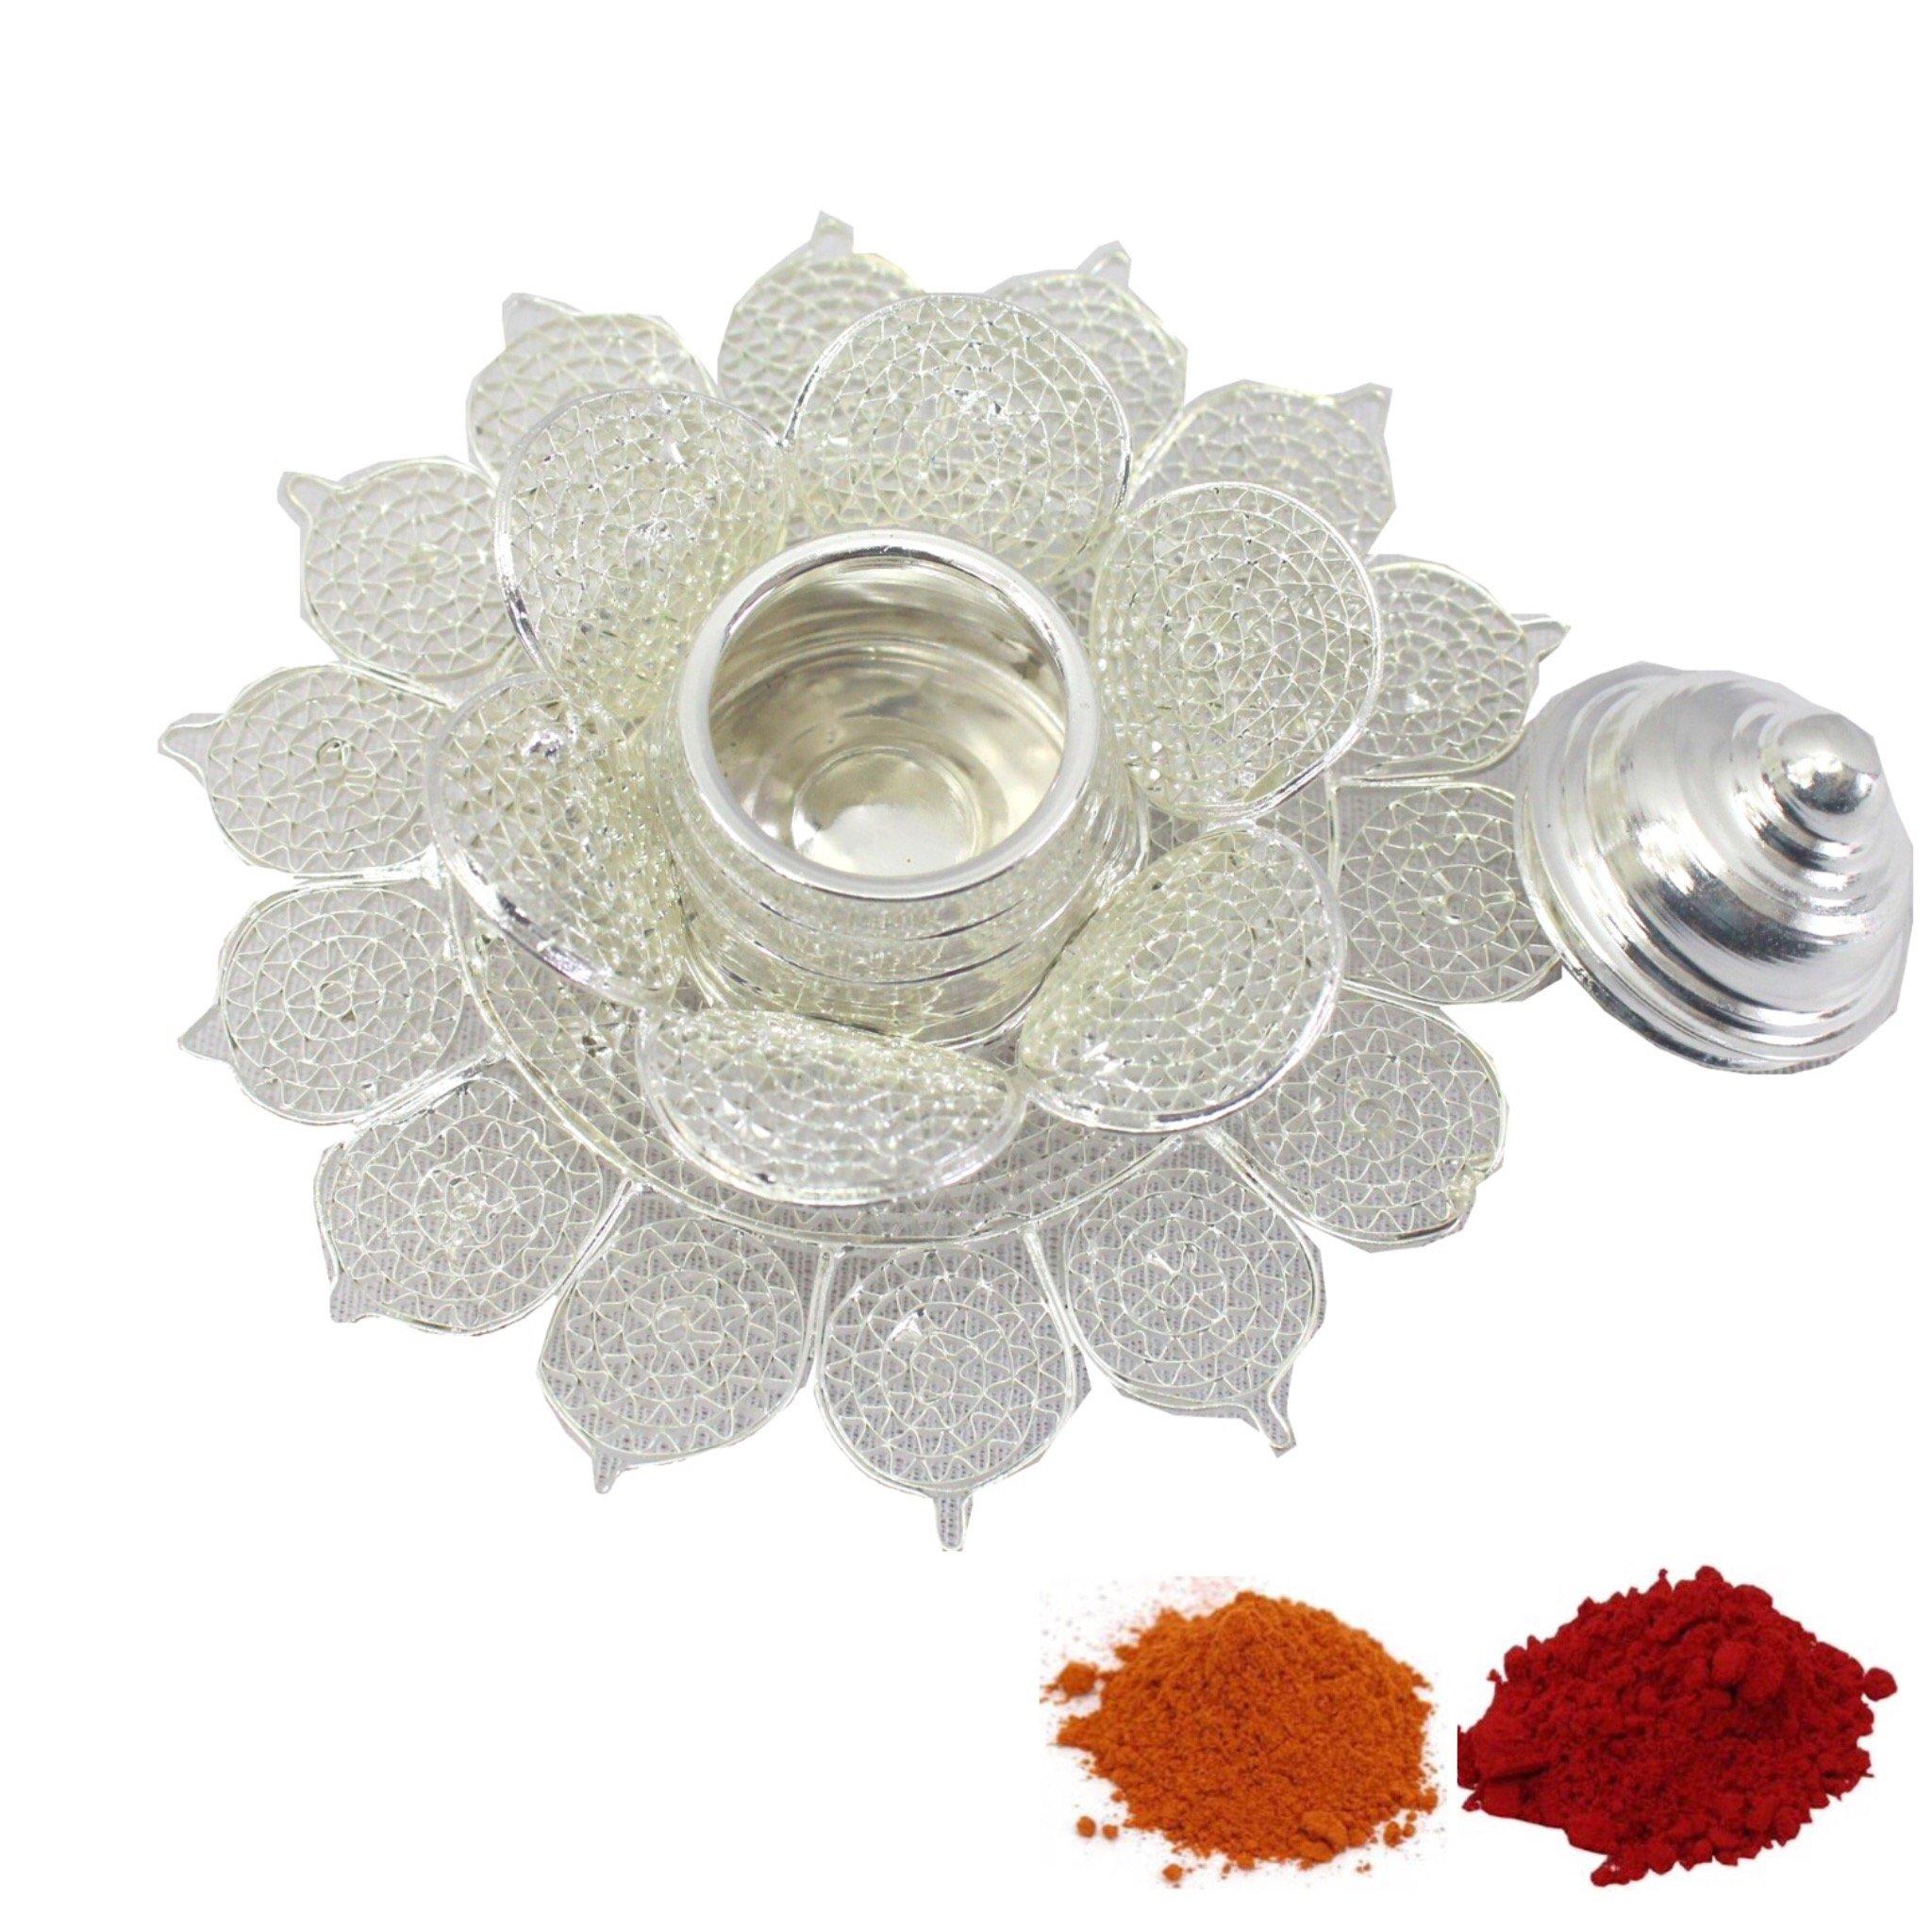 Indian Traditional Decorative Pooja thali Beautiful Lakshmi Festival Ethnic Gift for her/Kankavati / Diwali/Indian Handicraft/Home / Temple/Office / Wedding Gift/Bulk Gift. GS29